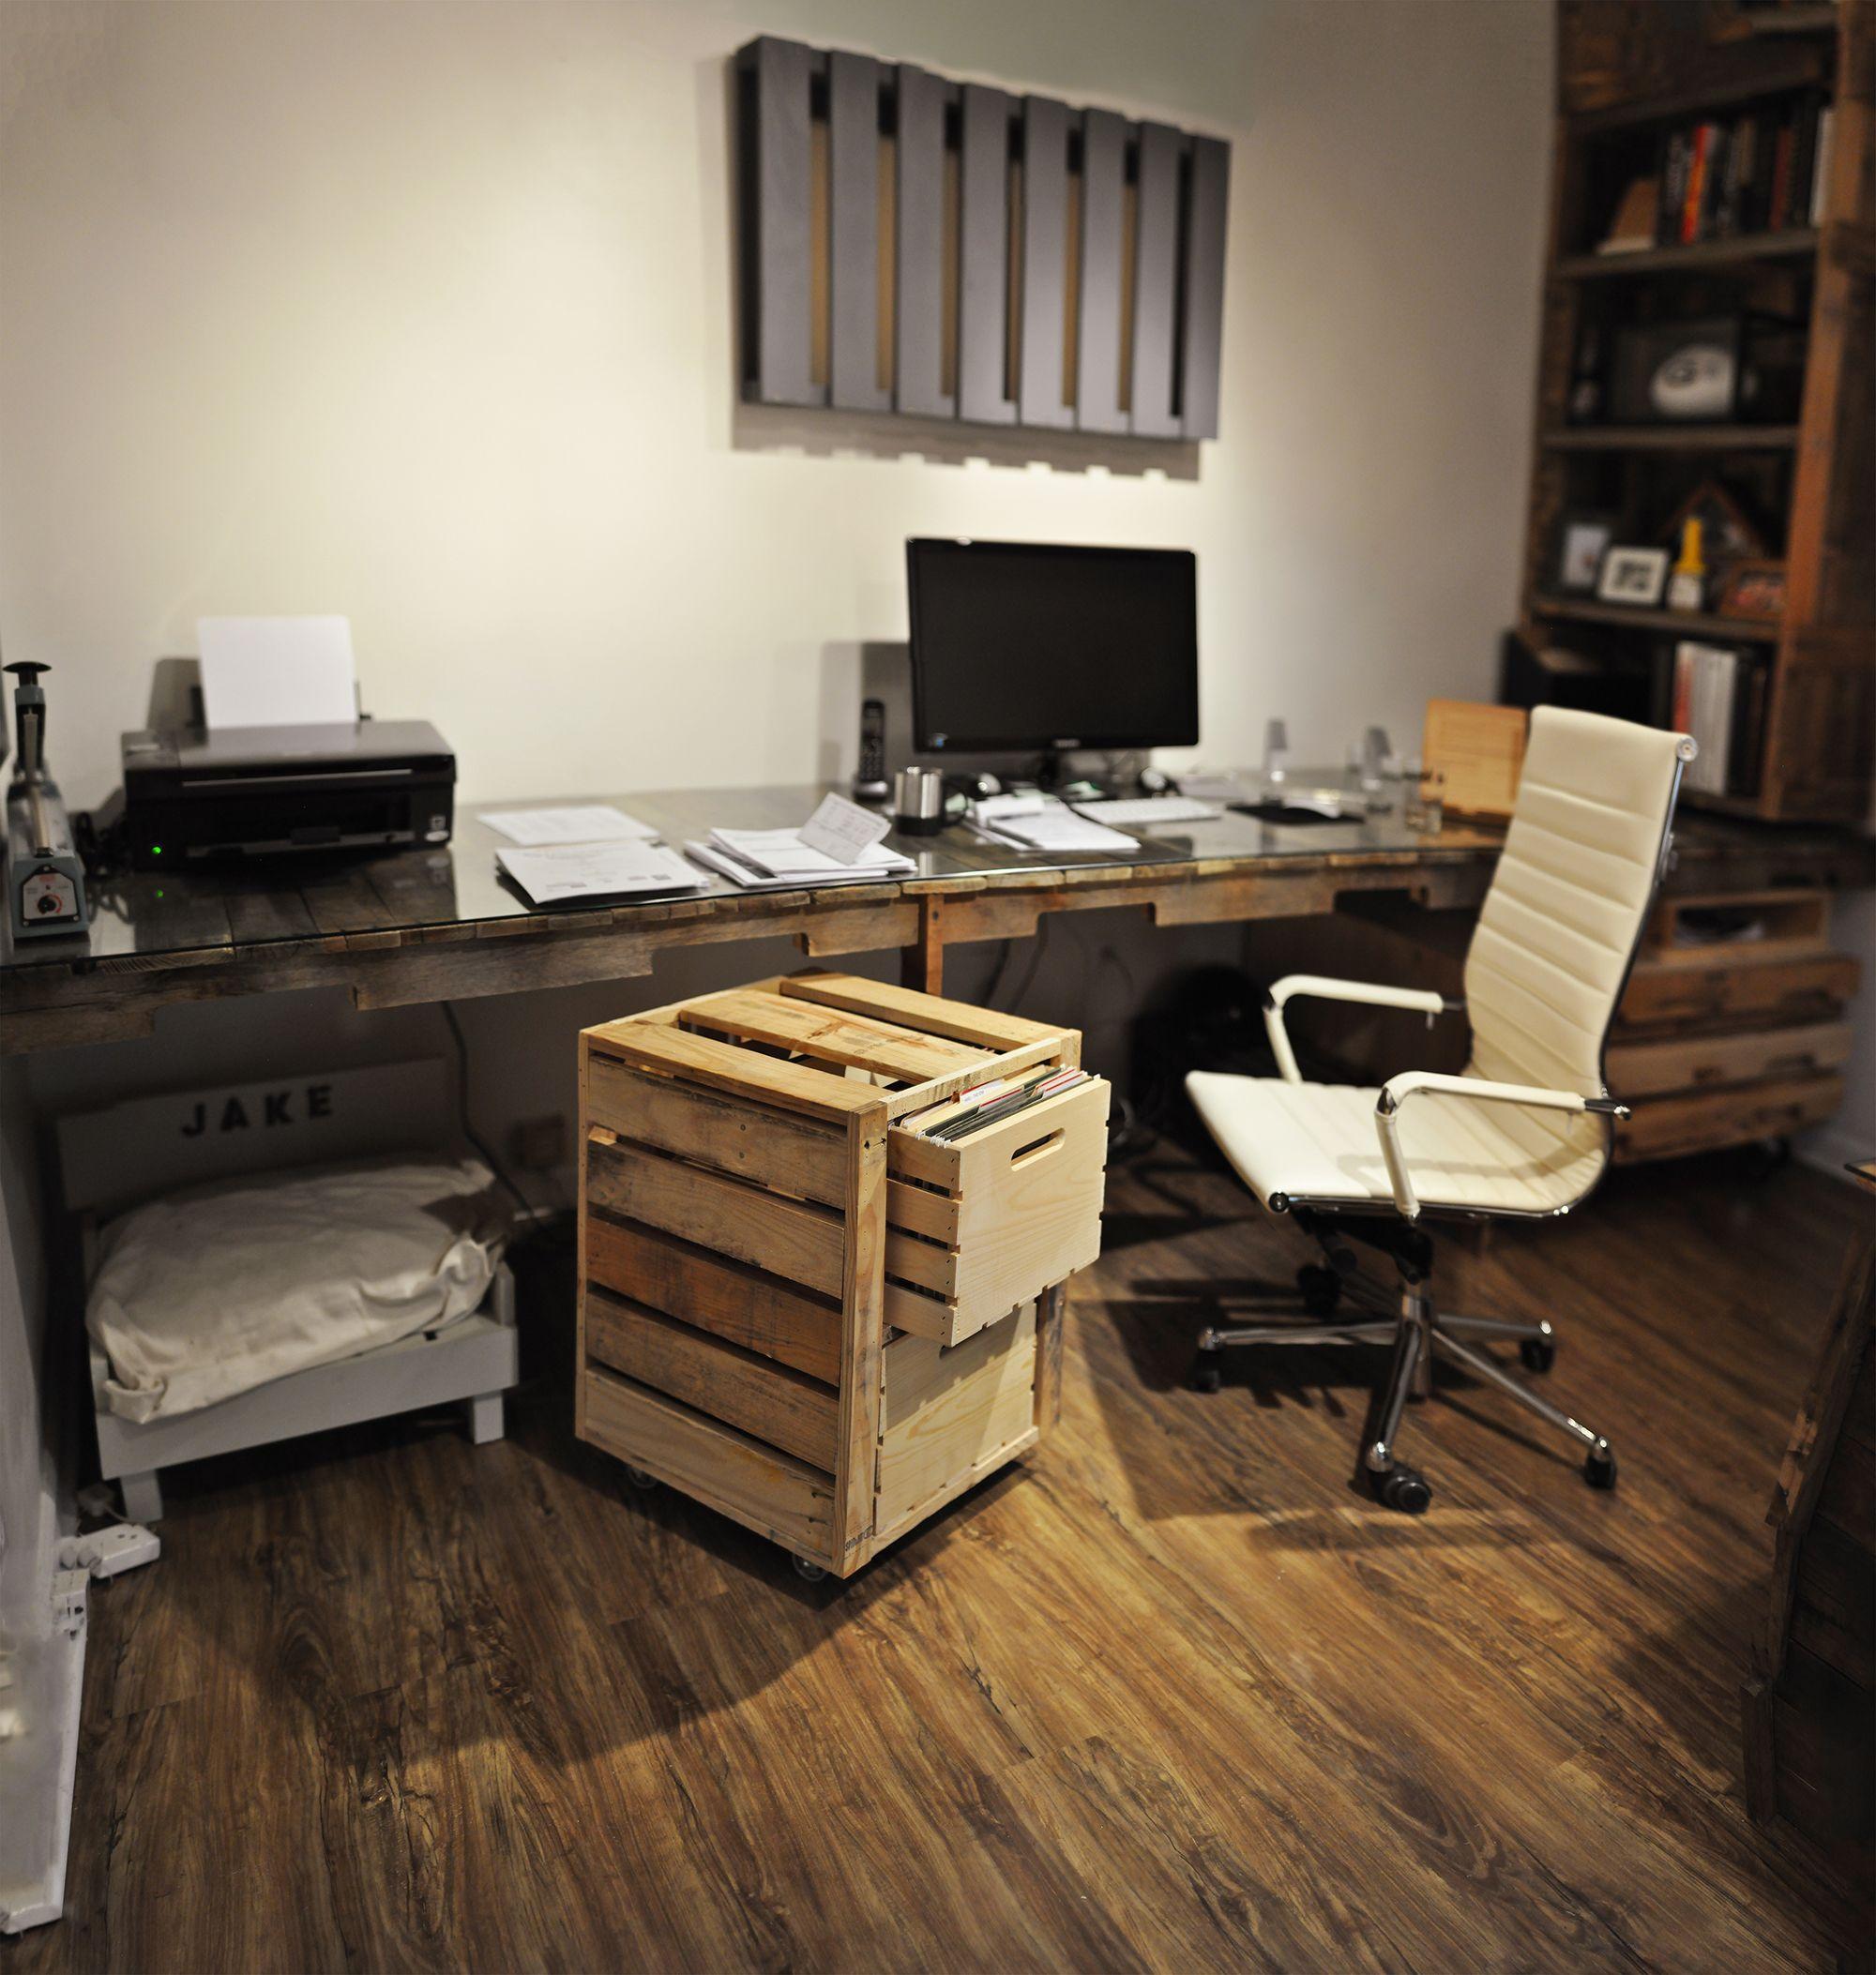 office desk europalets endsdiy. Pallet Crates Office Desk Europalets Endsdiy